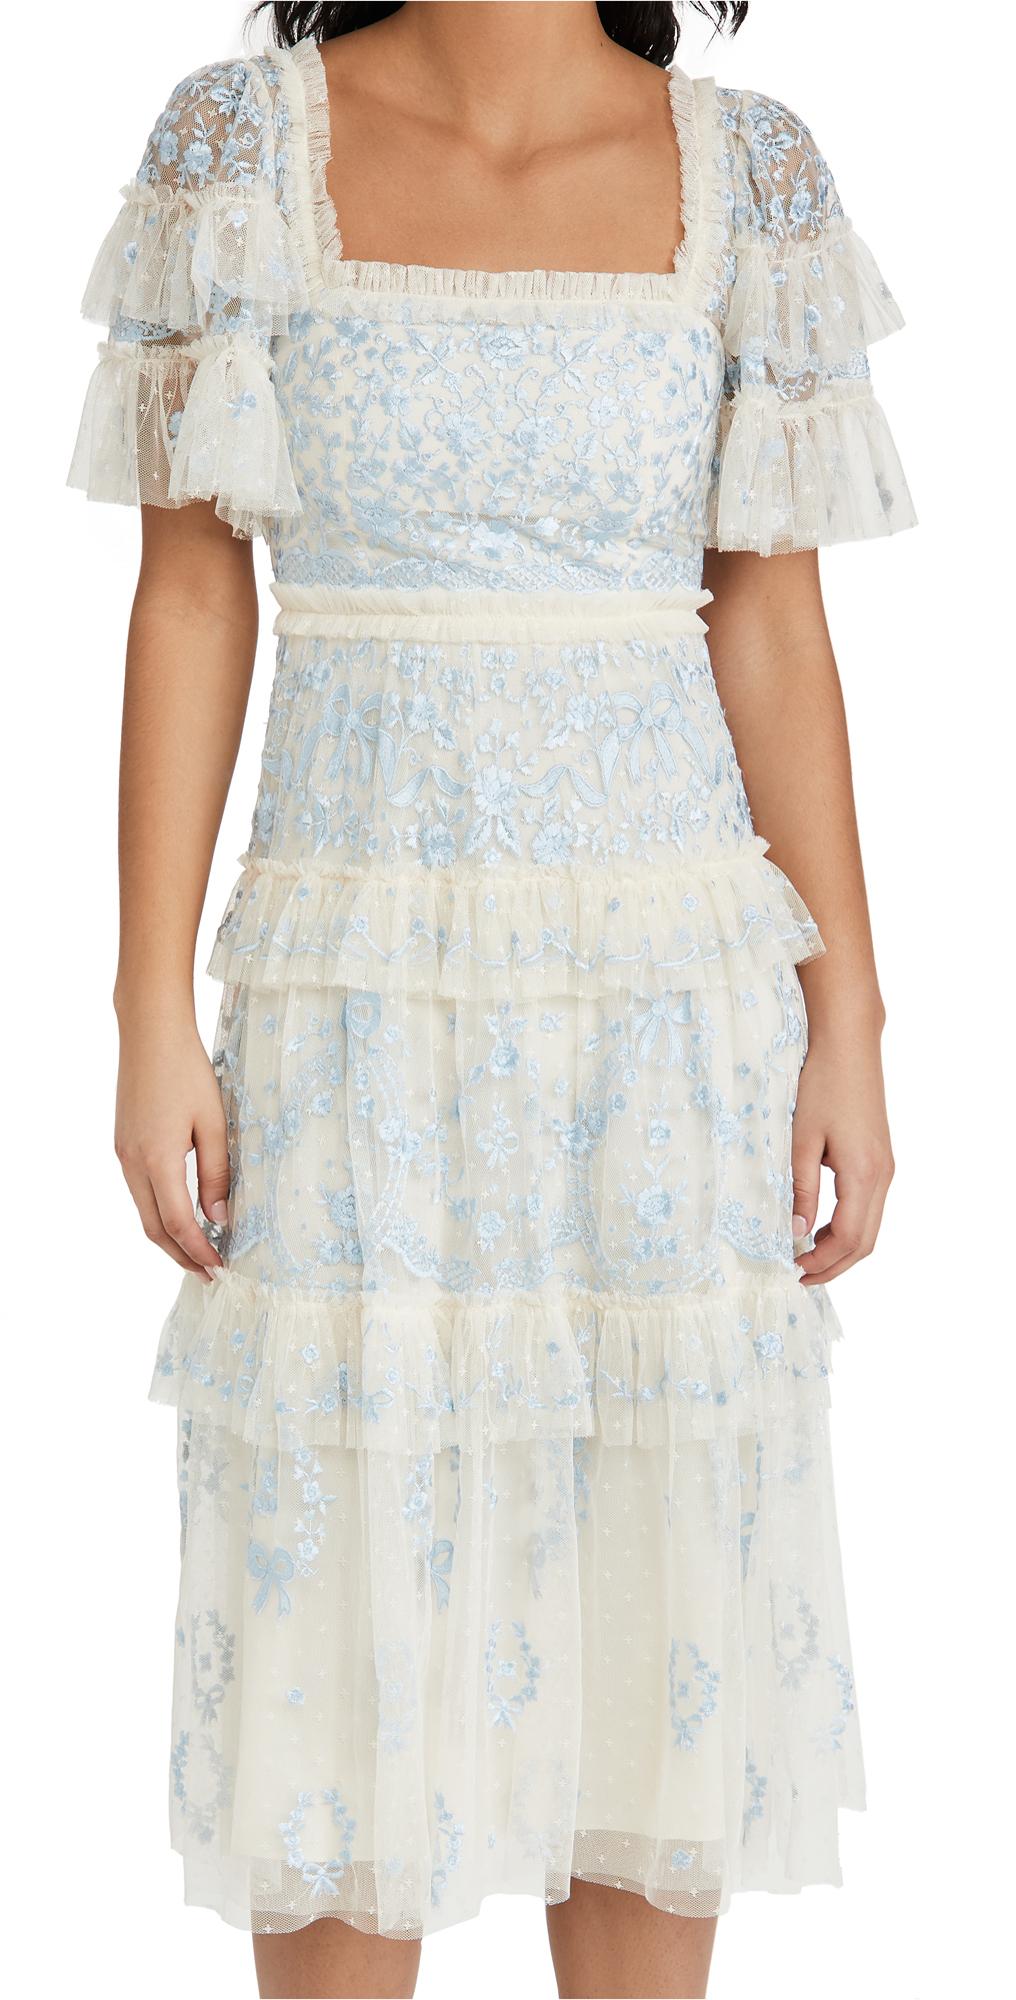 Needle & Thread Arwen Midaxi Dress